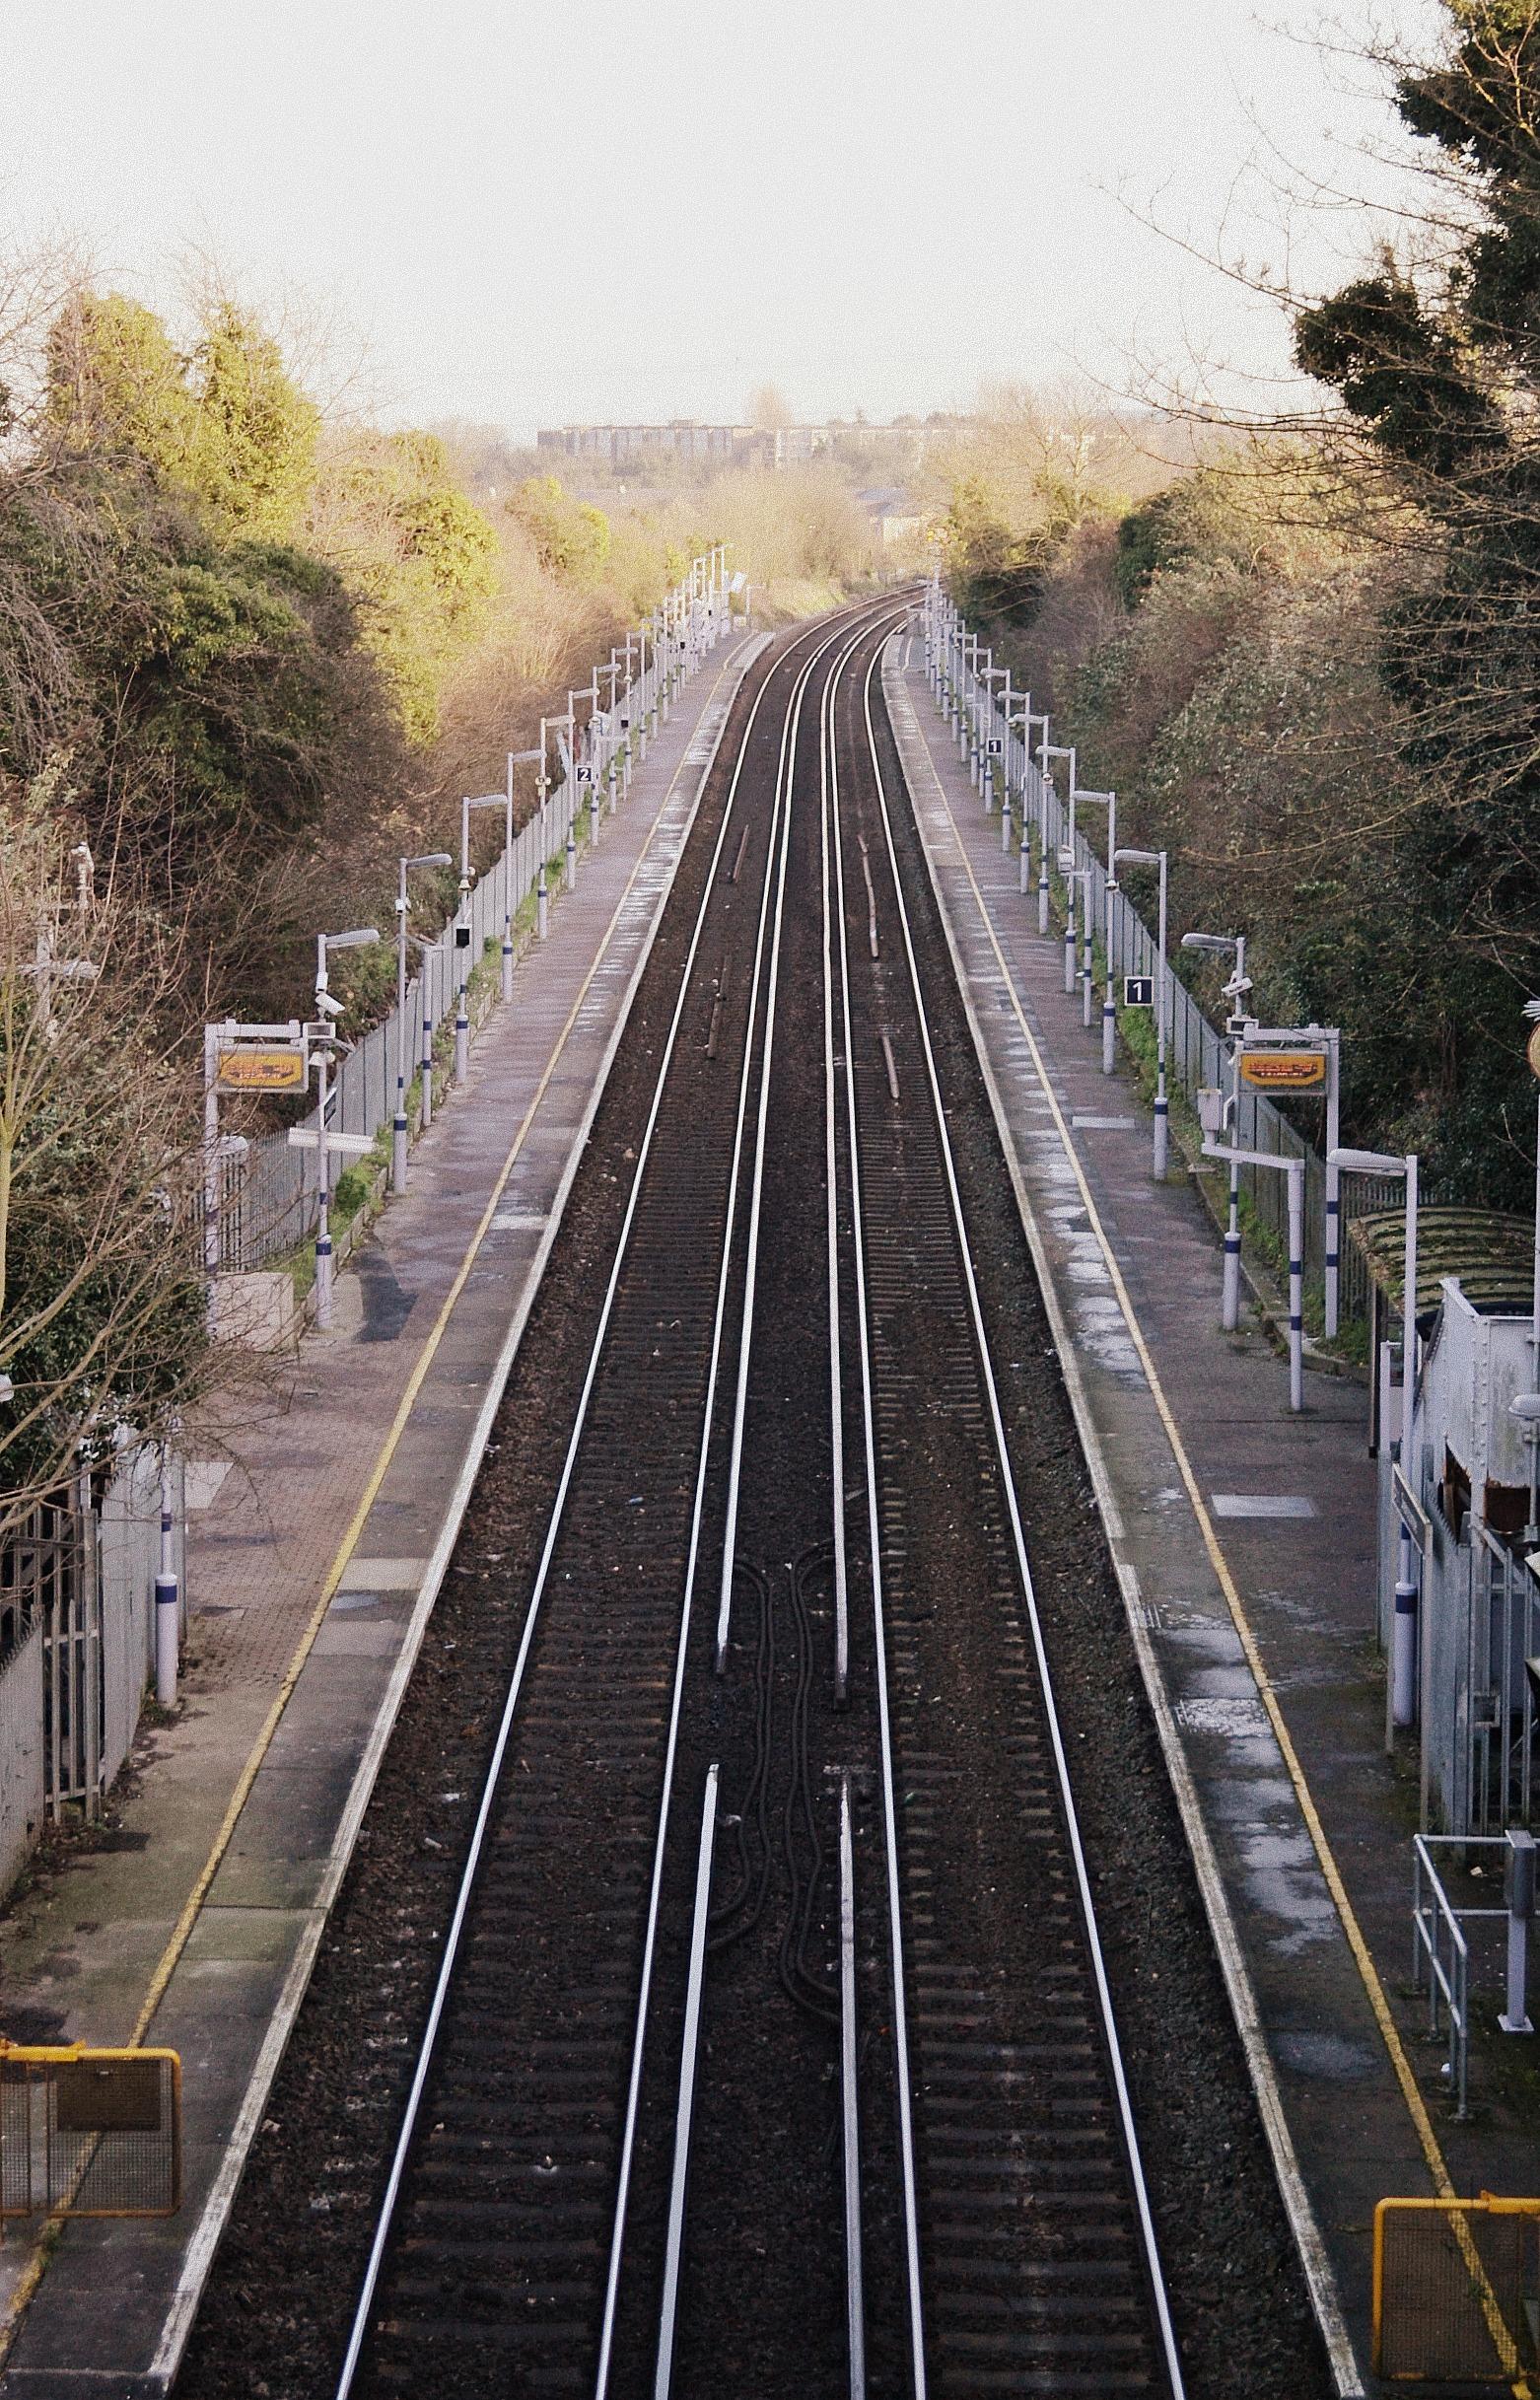 Swanscombe Rail Station